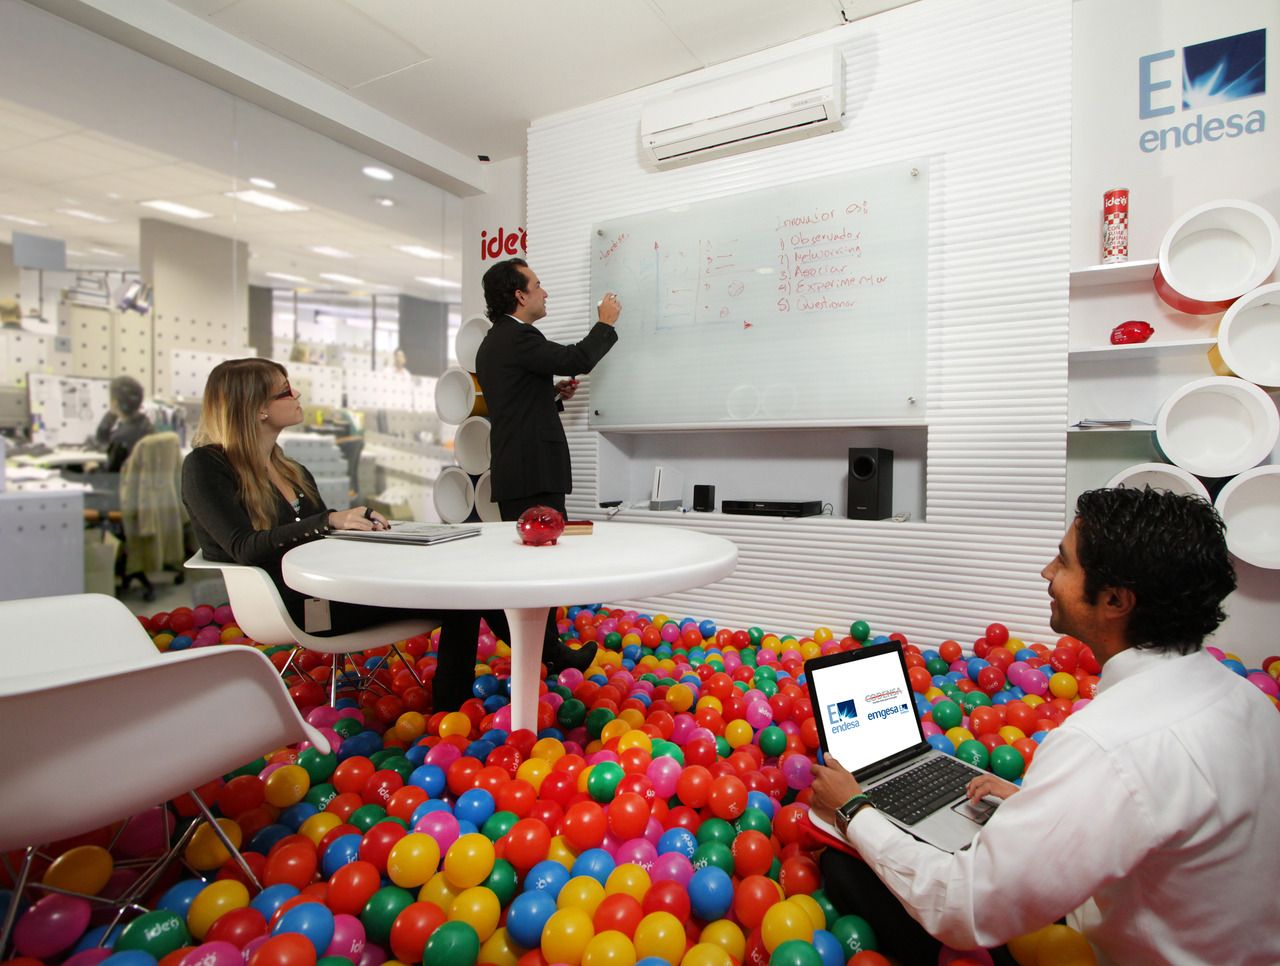 fun office design ideas Pin by mun sy on david | Fun office design, Office lounge